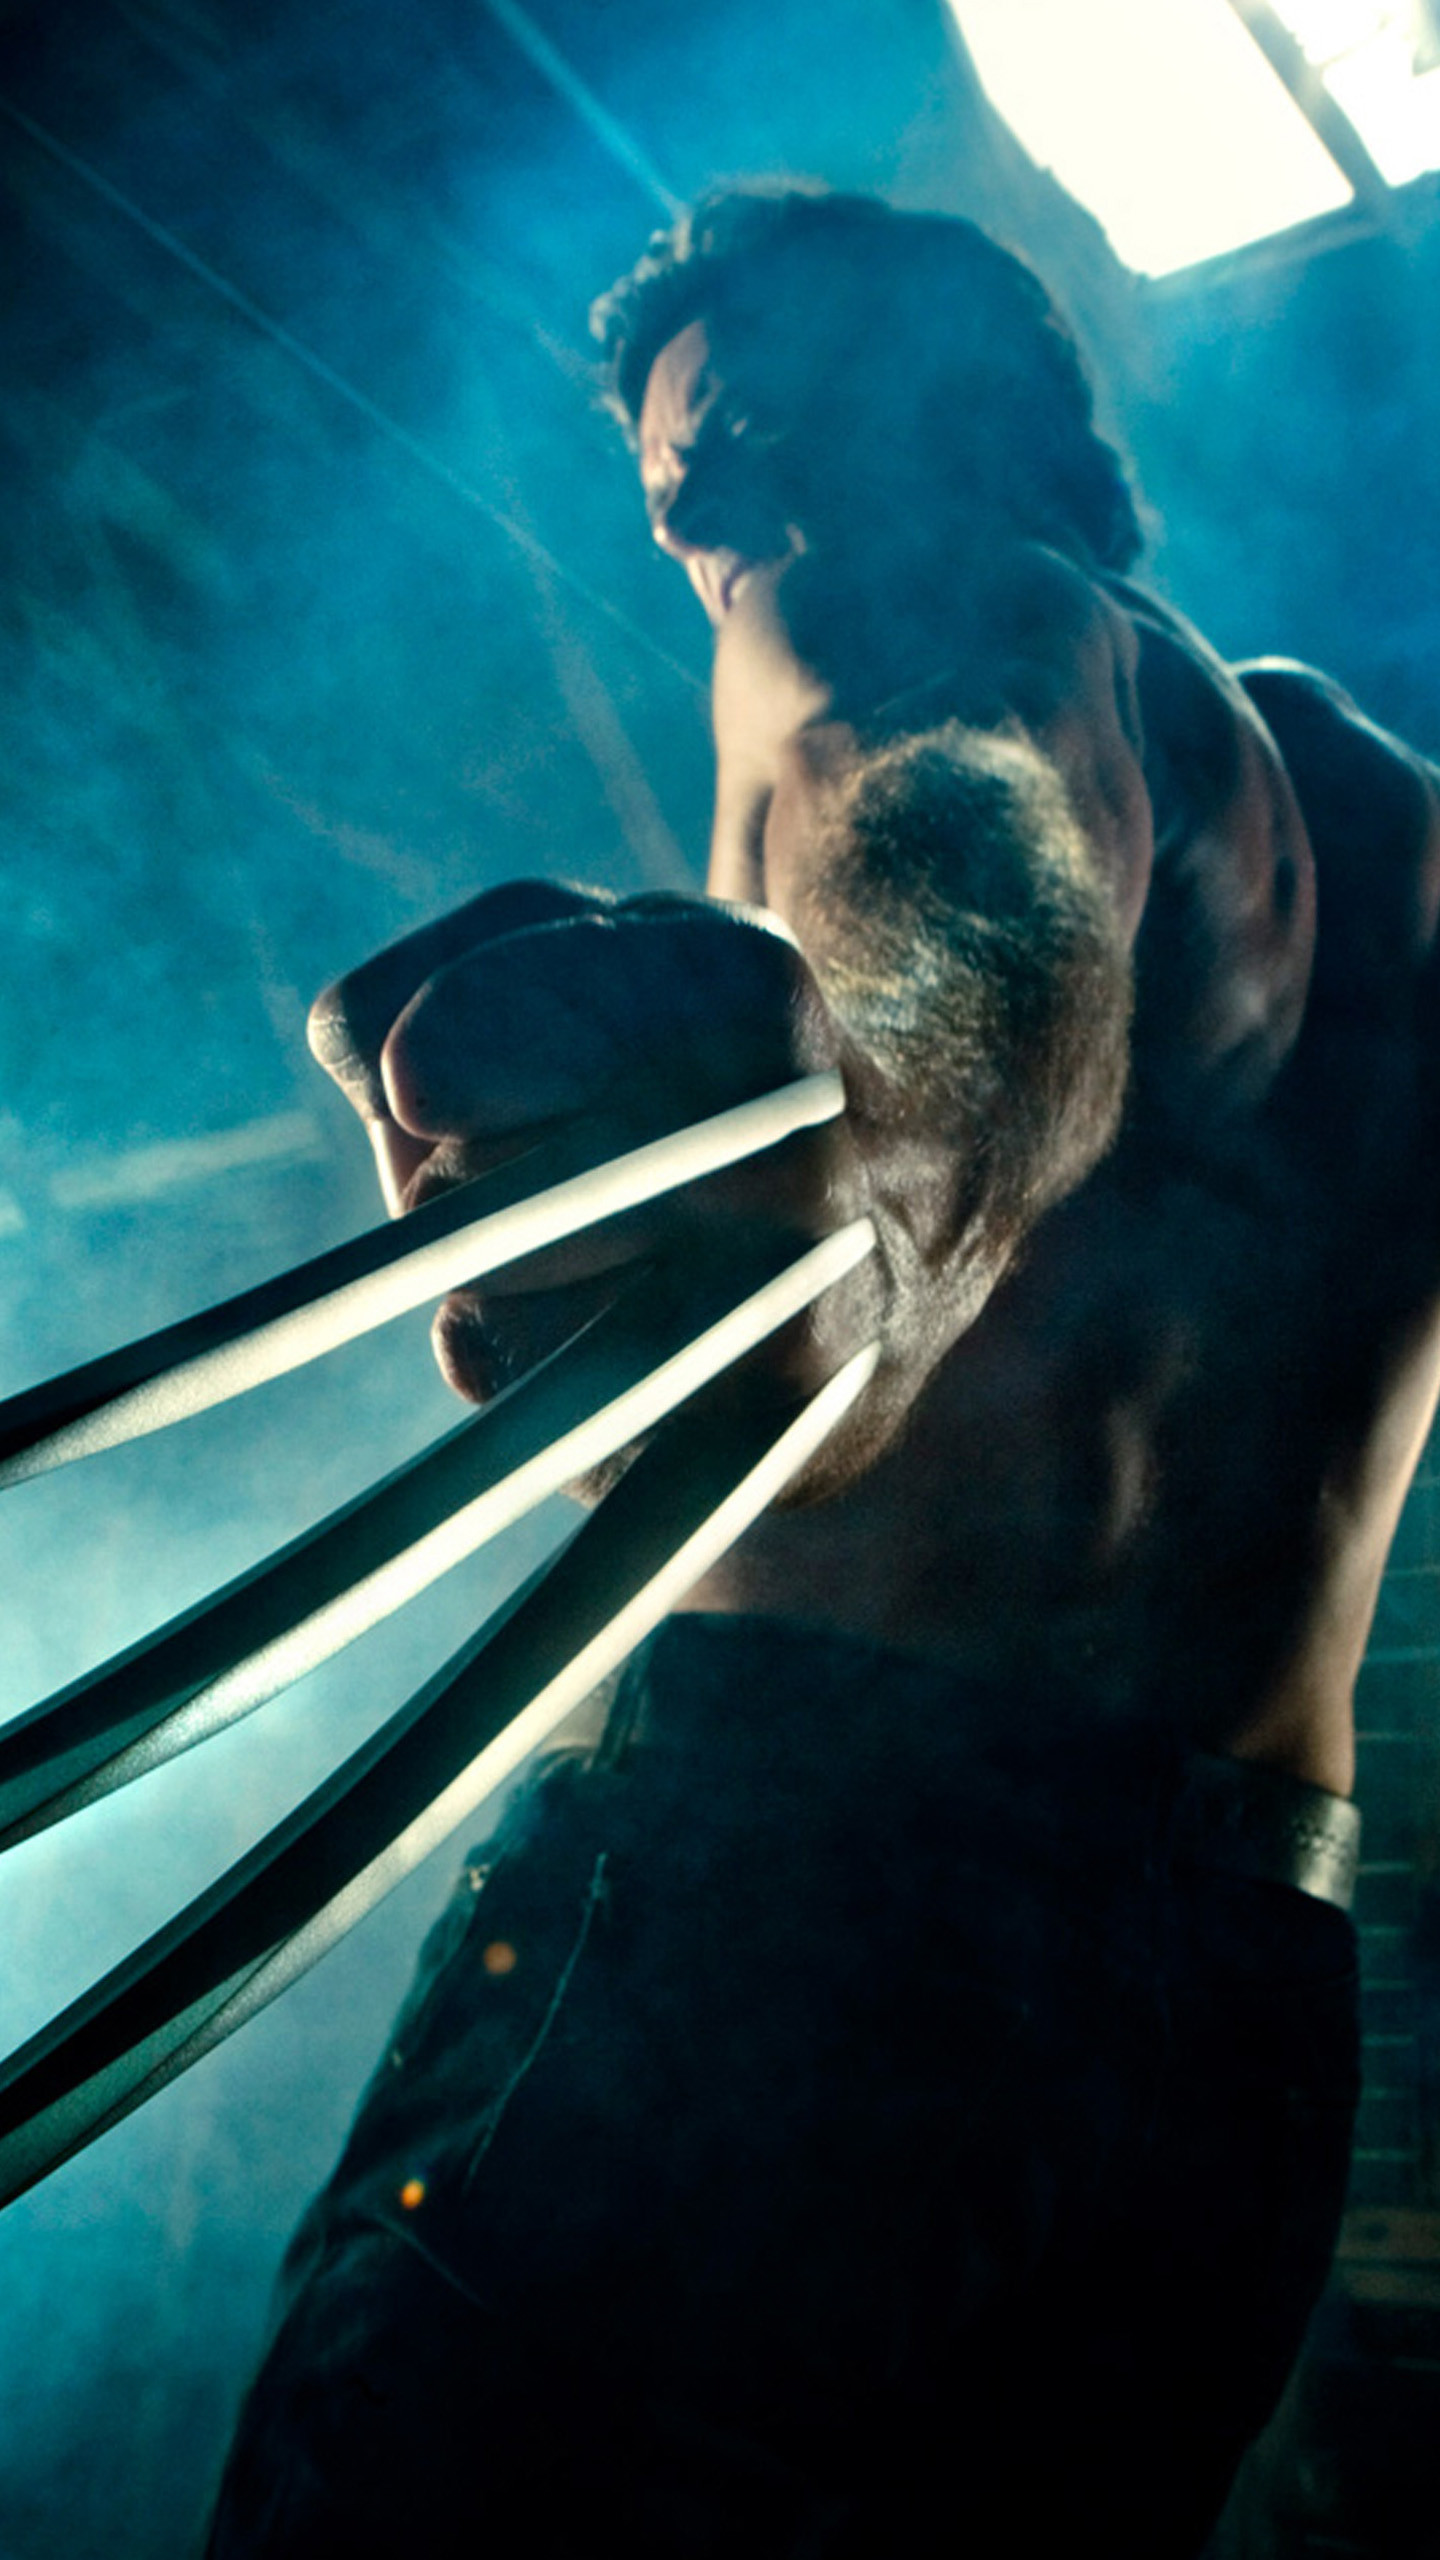 Xmen Wolverine LG G3 Wallpapers